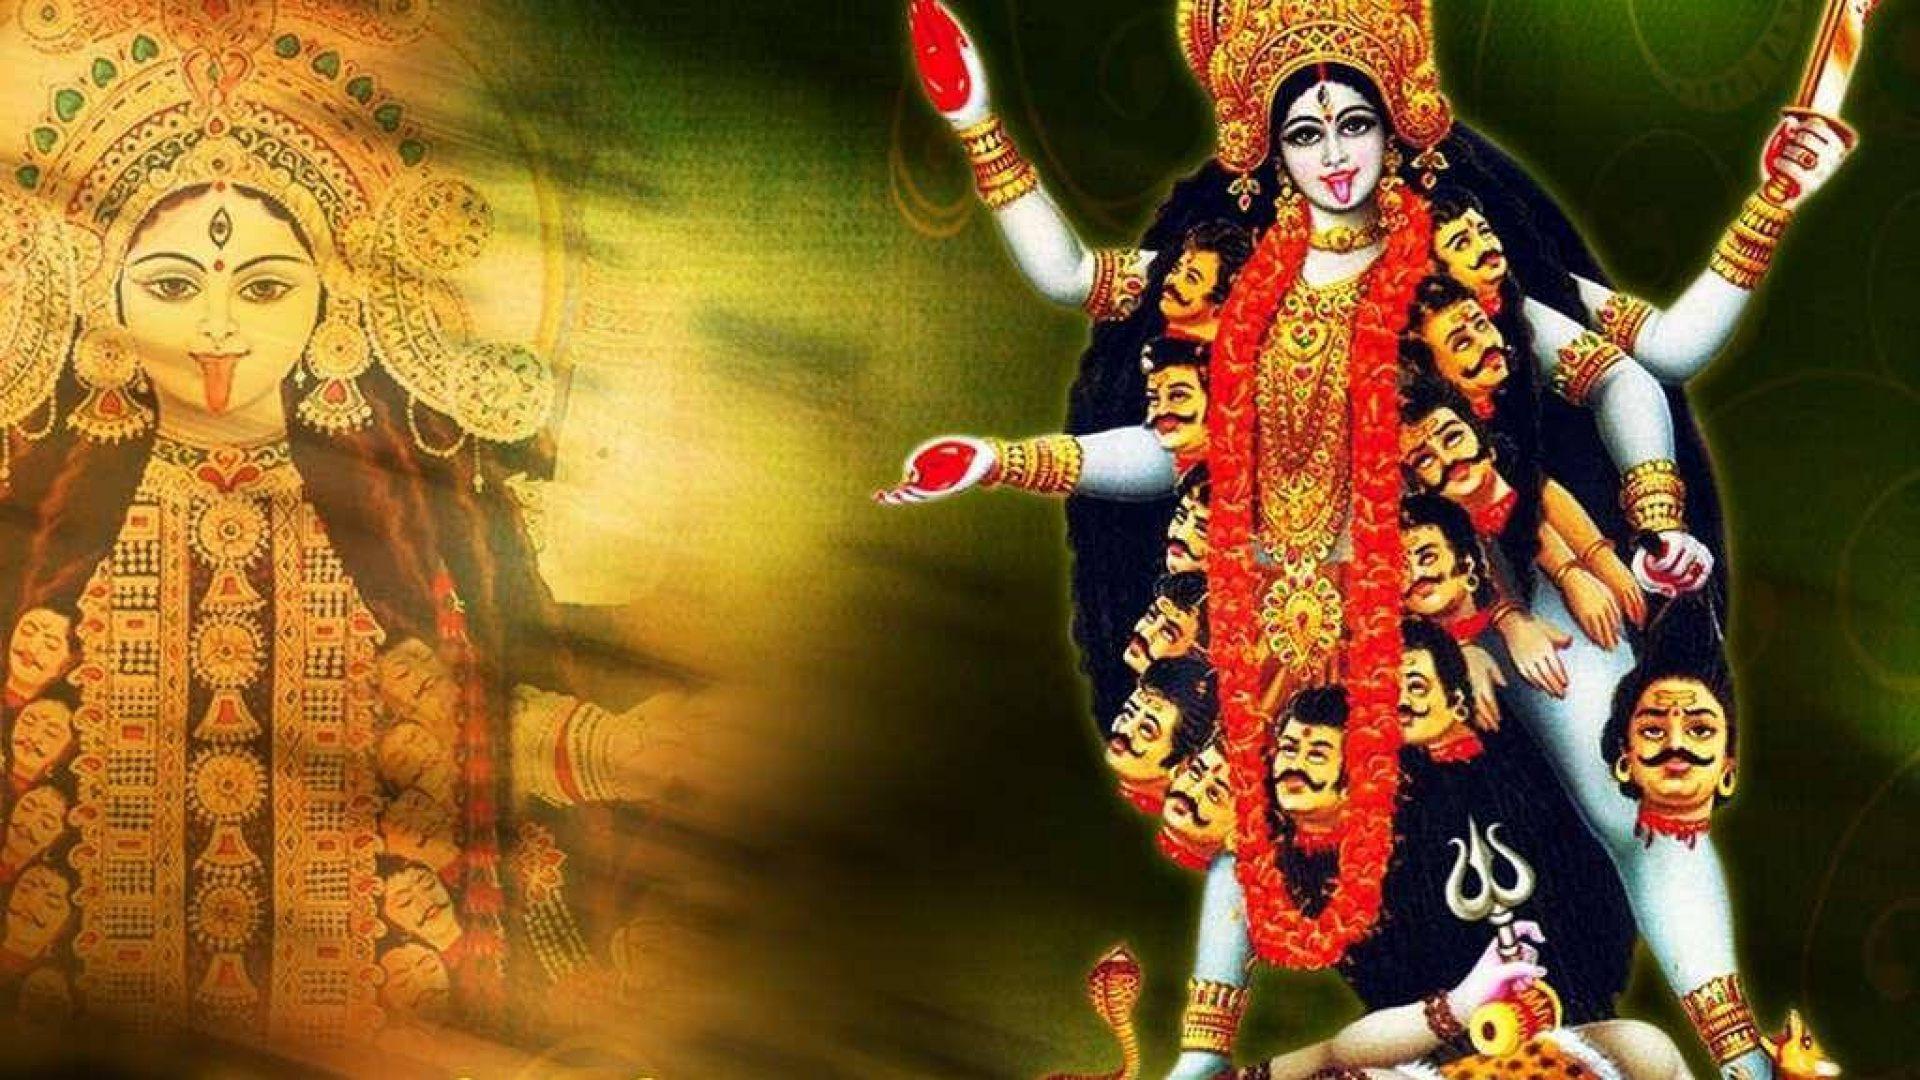 Maa Kali Image For Desktop